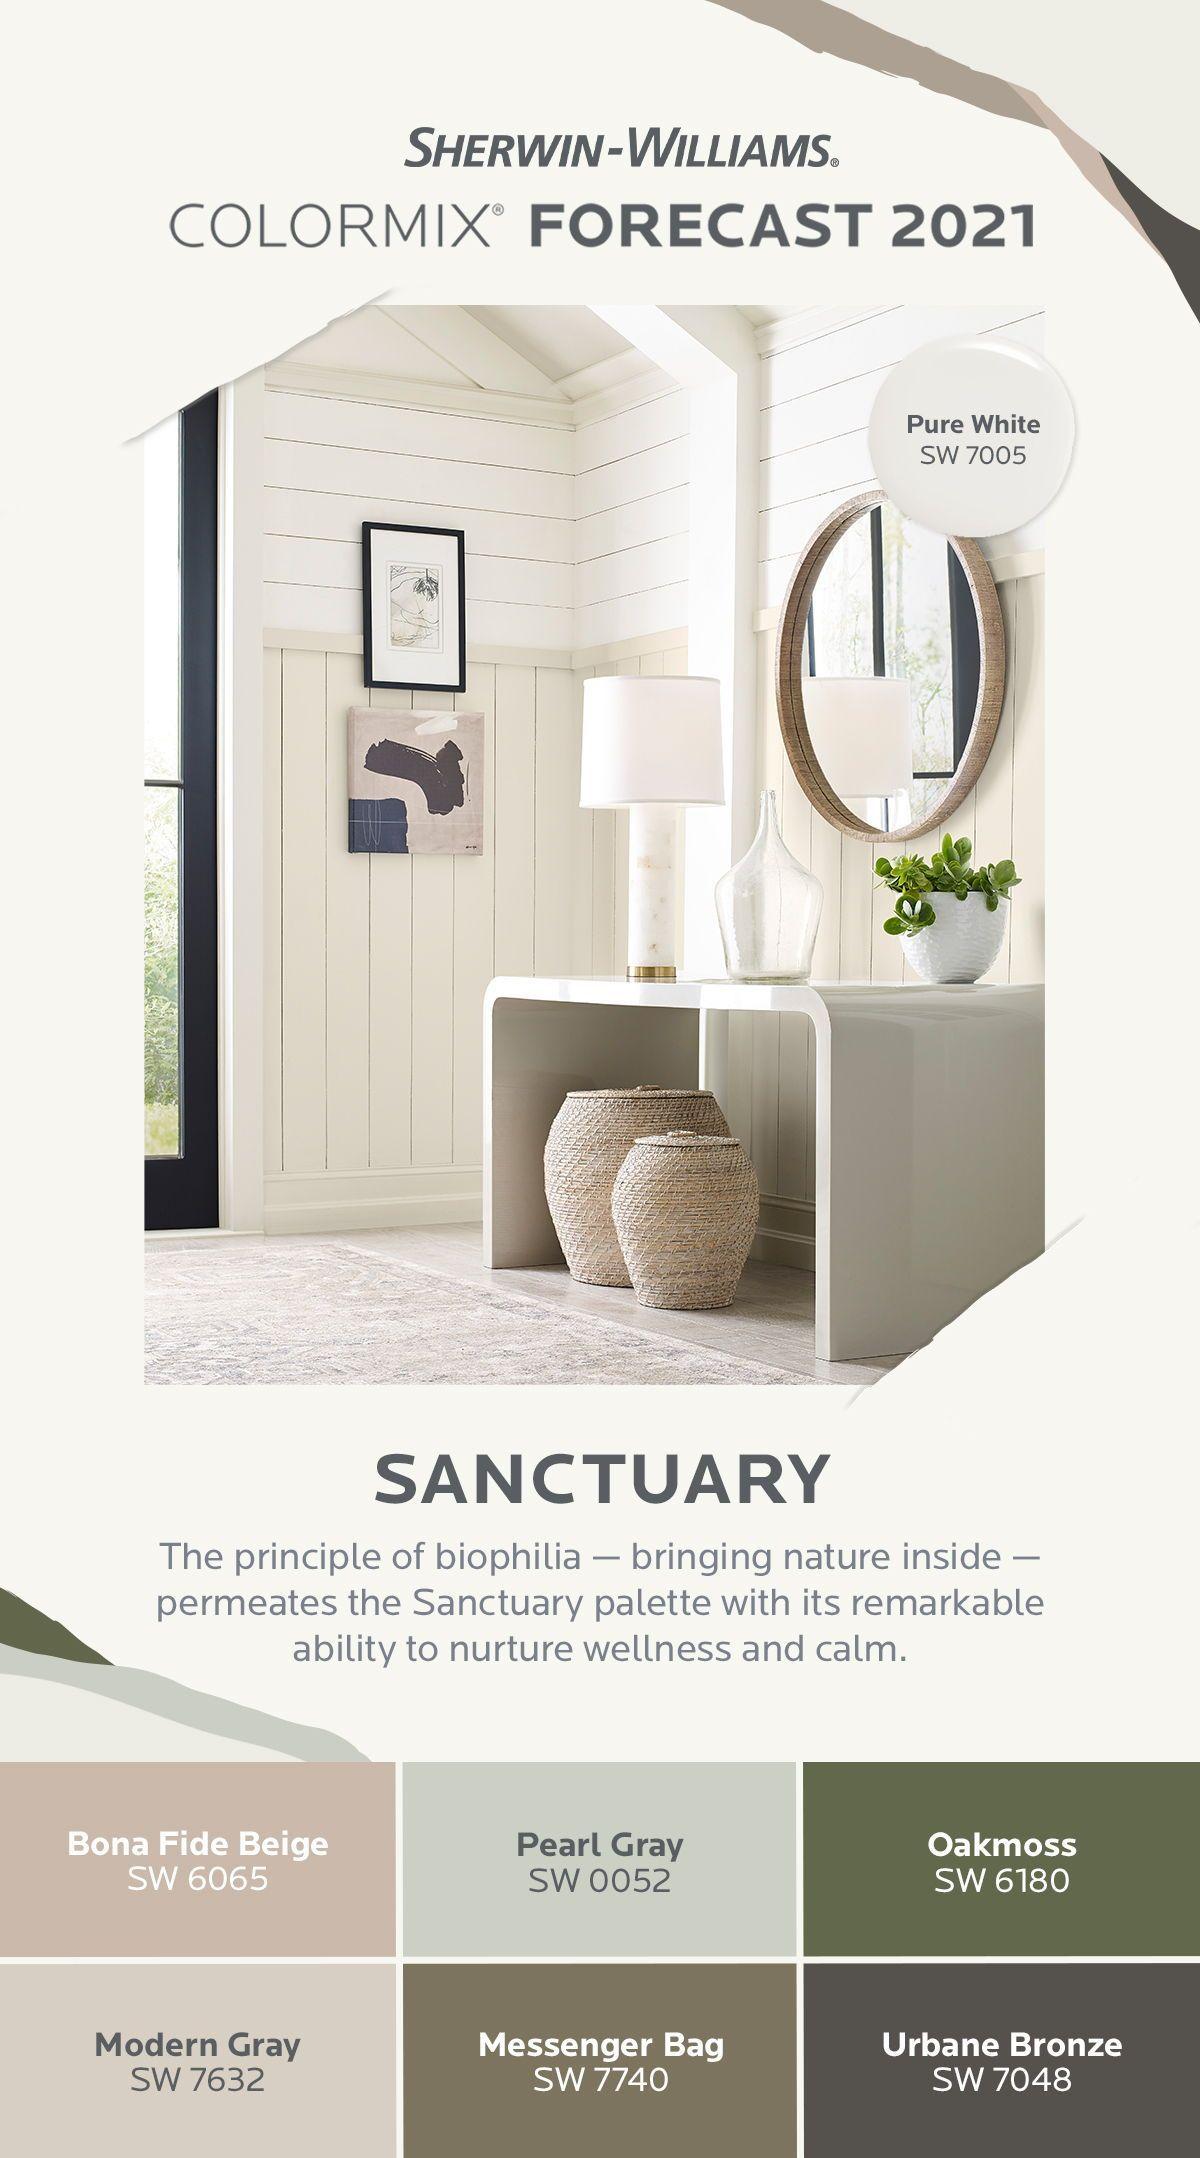 Sherwin Williams 2021 Colormix Forecast Sanctuary Palette Paint Colors For Living Room Trending Paint Colors Paint Colors For Home